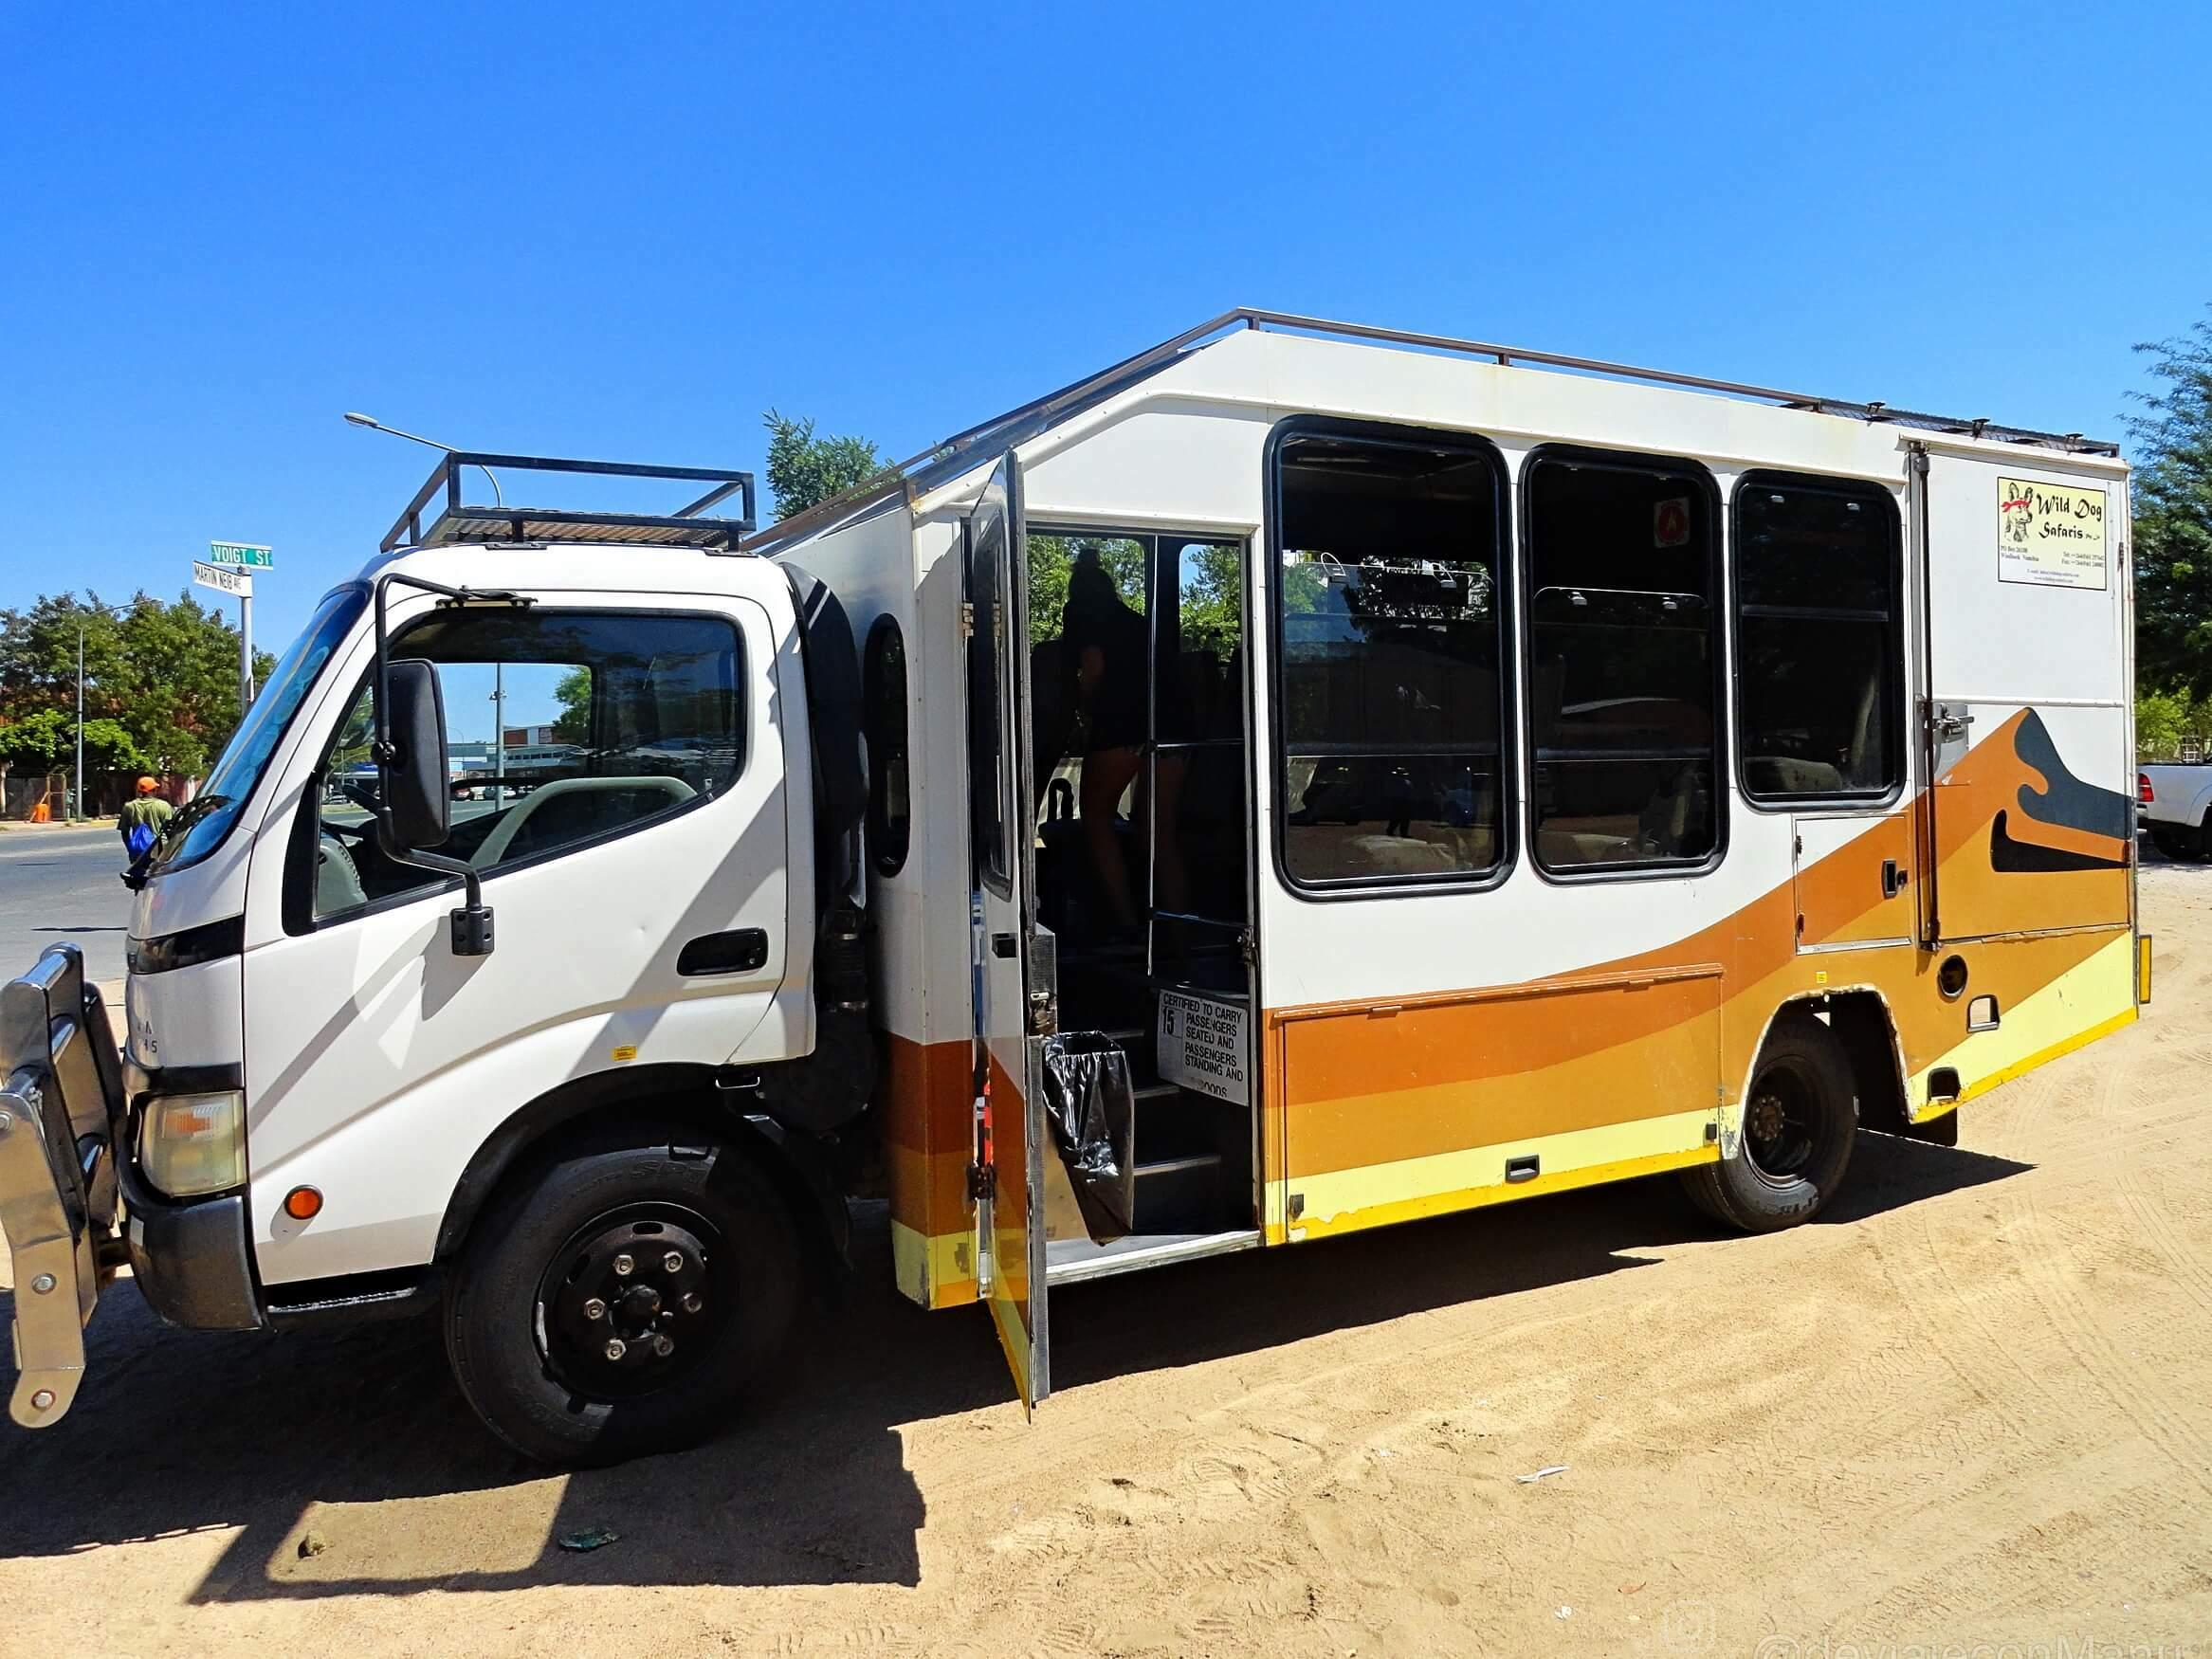 Camión Wild dog safaris